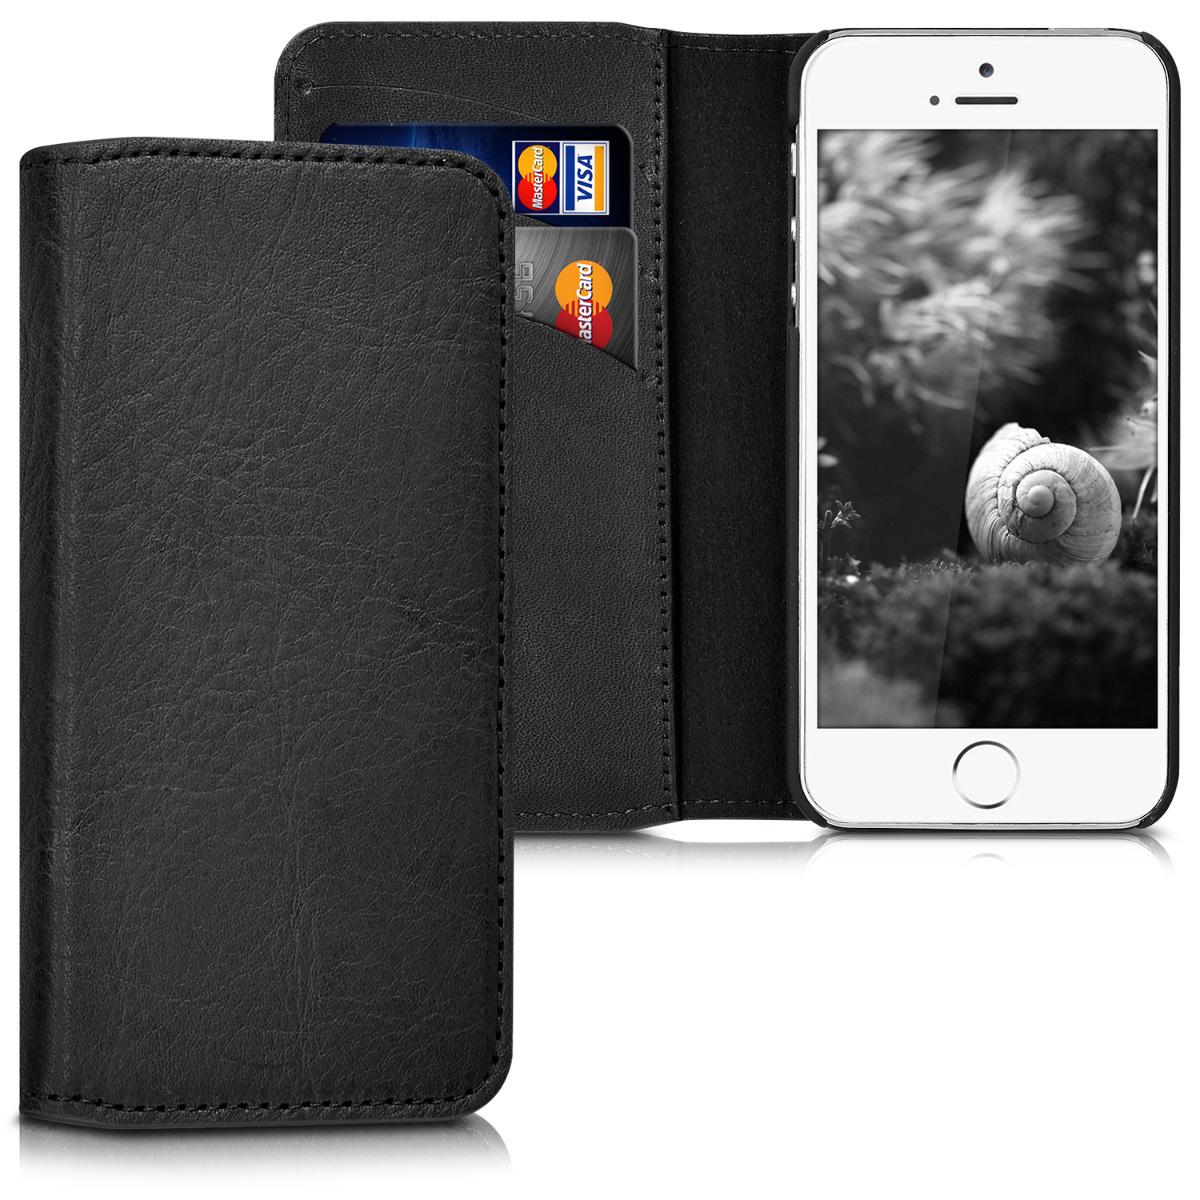 Kalibri Δερμάτινη Suede Θήκη - Πορτοφόλι Apple iPhone SE / 5 / 5S - Black (39400.01)